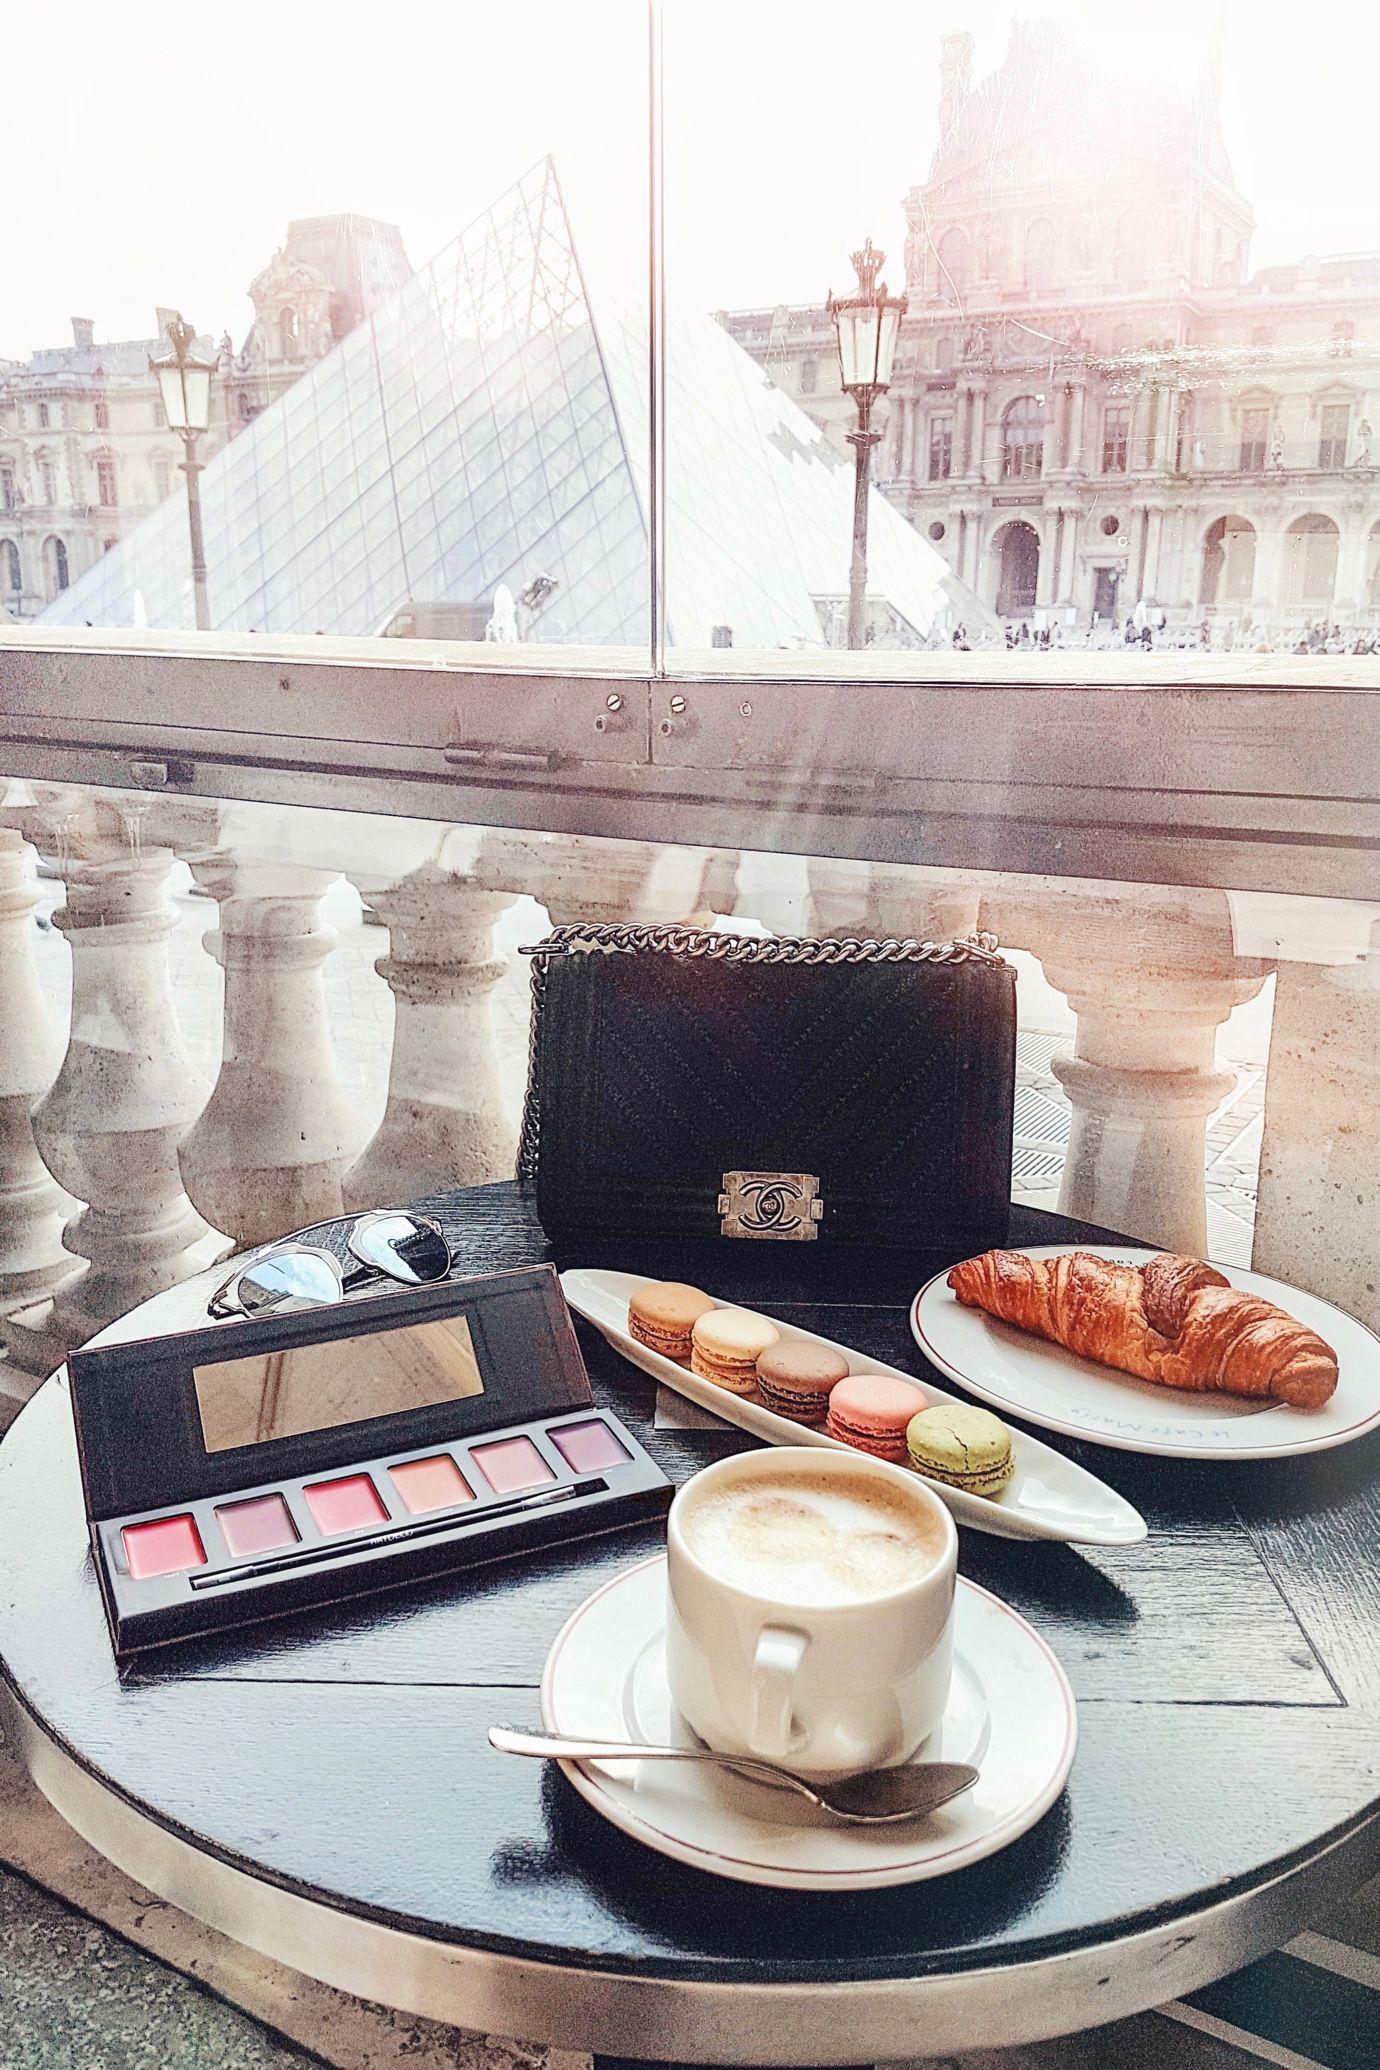 Louvre, Macarons & Chanel, Paris http://www.ohhcouture.com/2017/01/christmas-break-paris/ | #ohhcouture #LeonieHanne